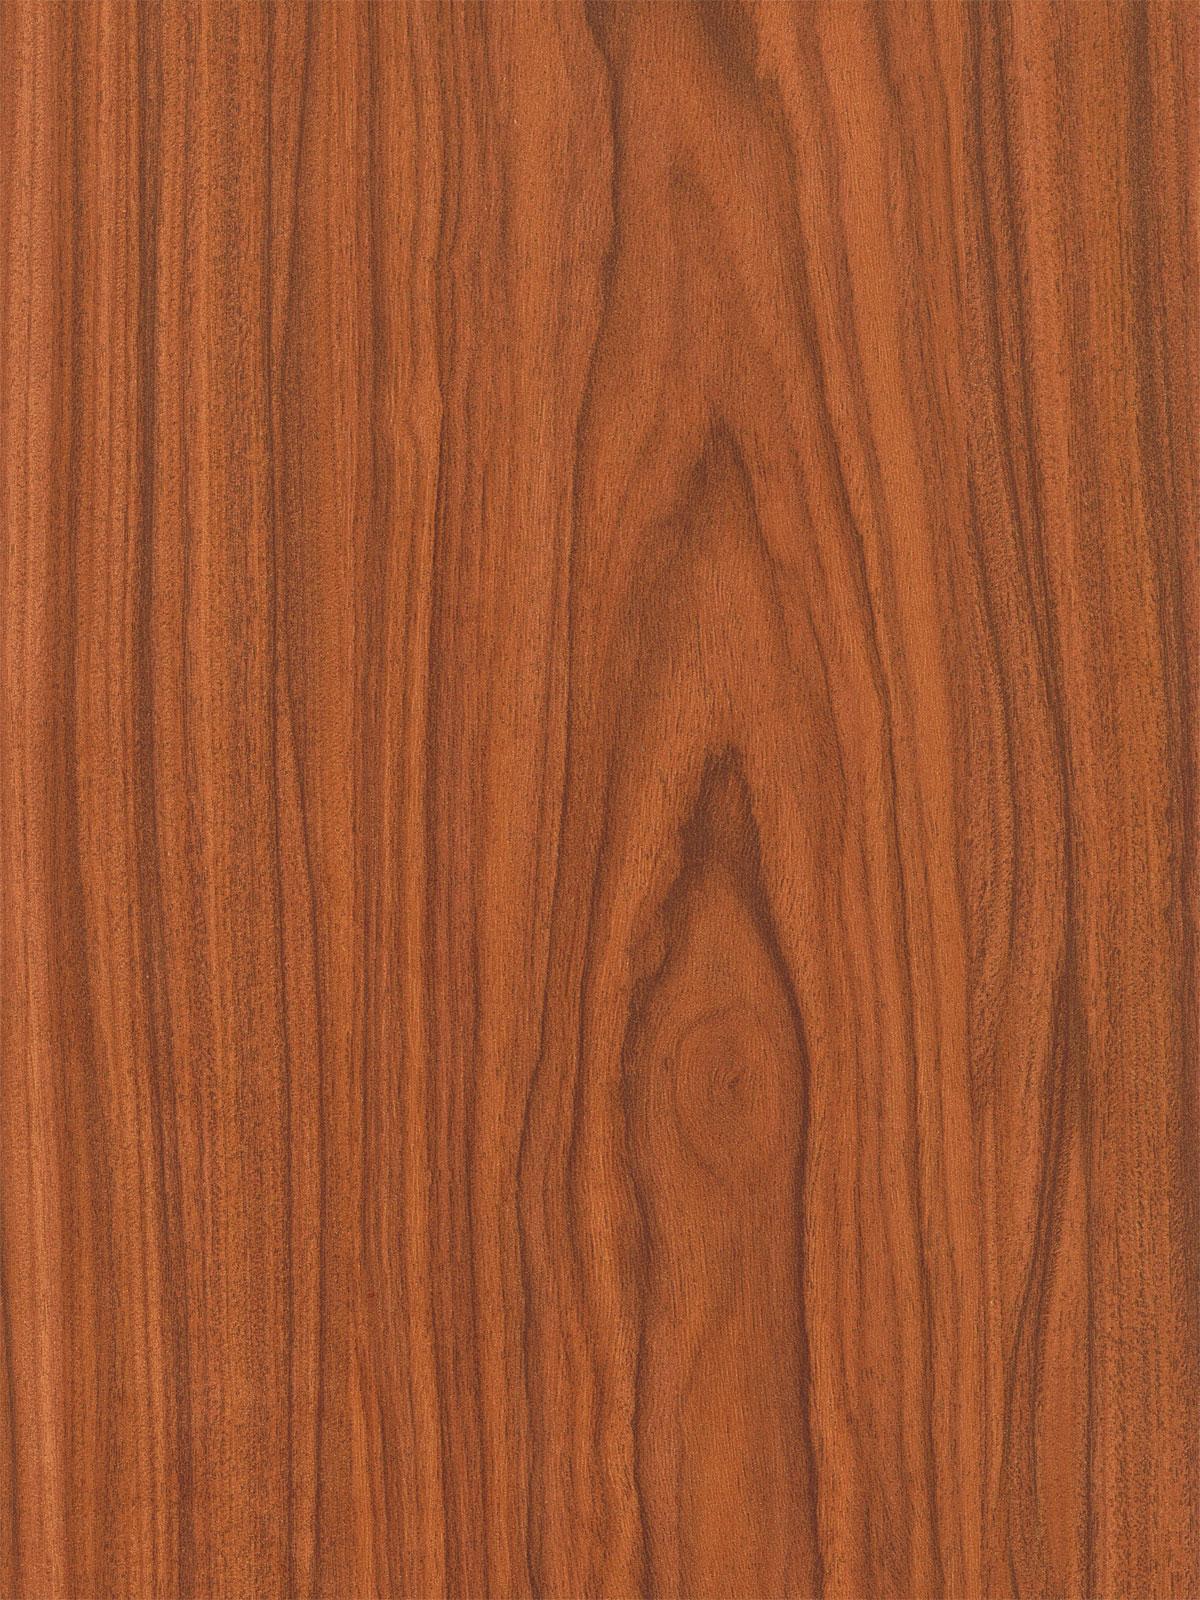 Welcome to china laminate flooring manufacturer of for Laminate wood flooring manufacturers